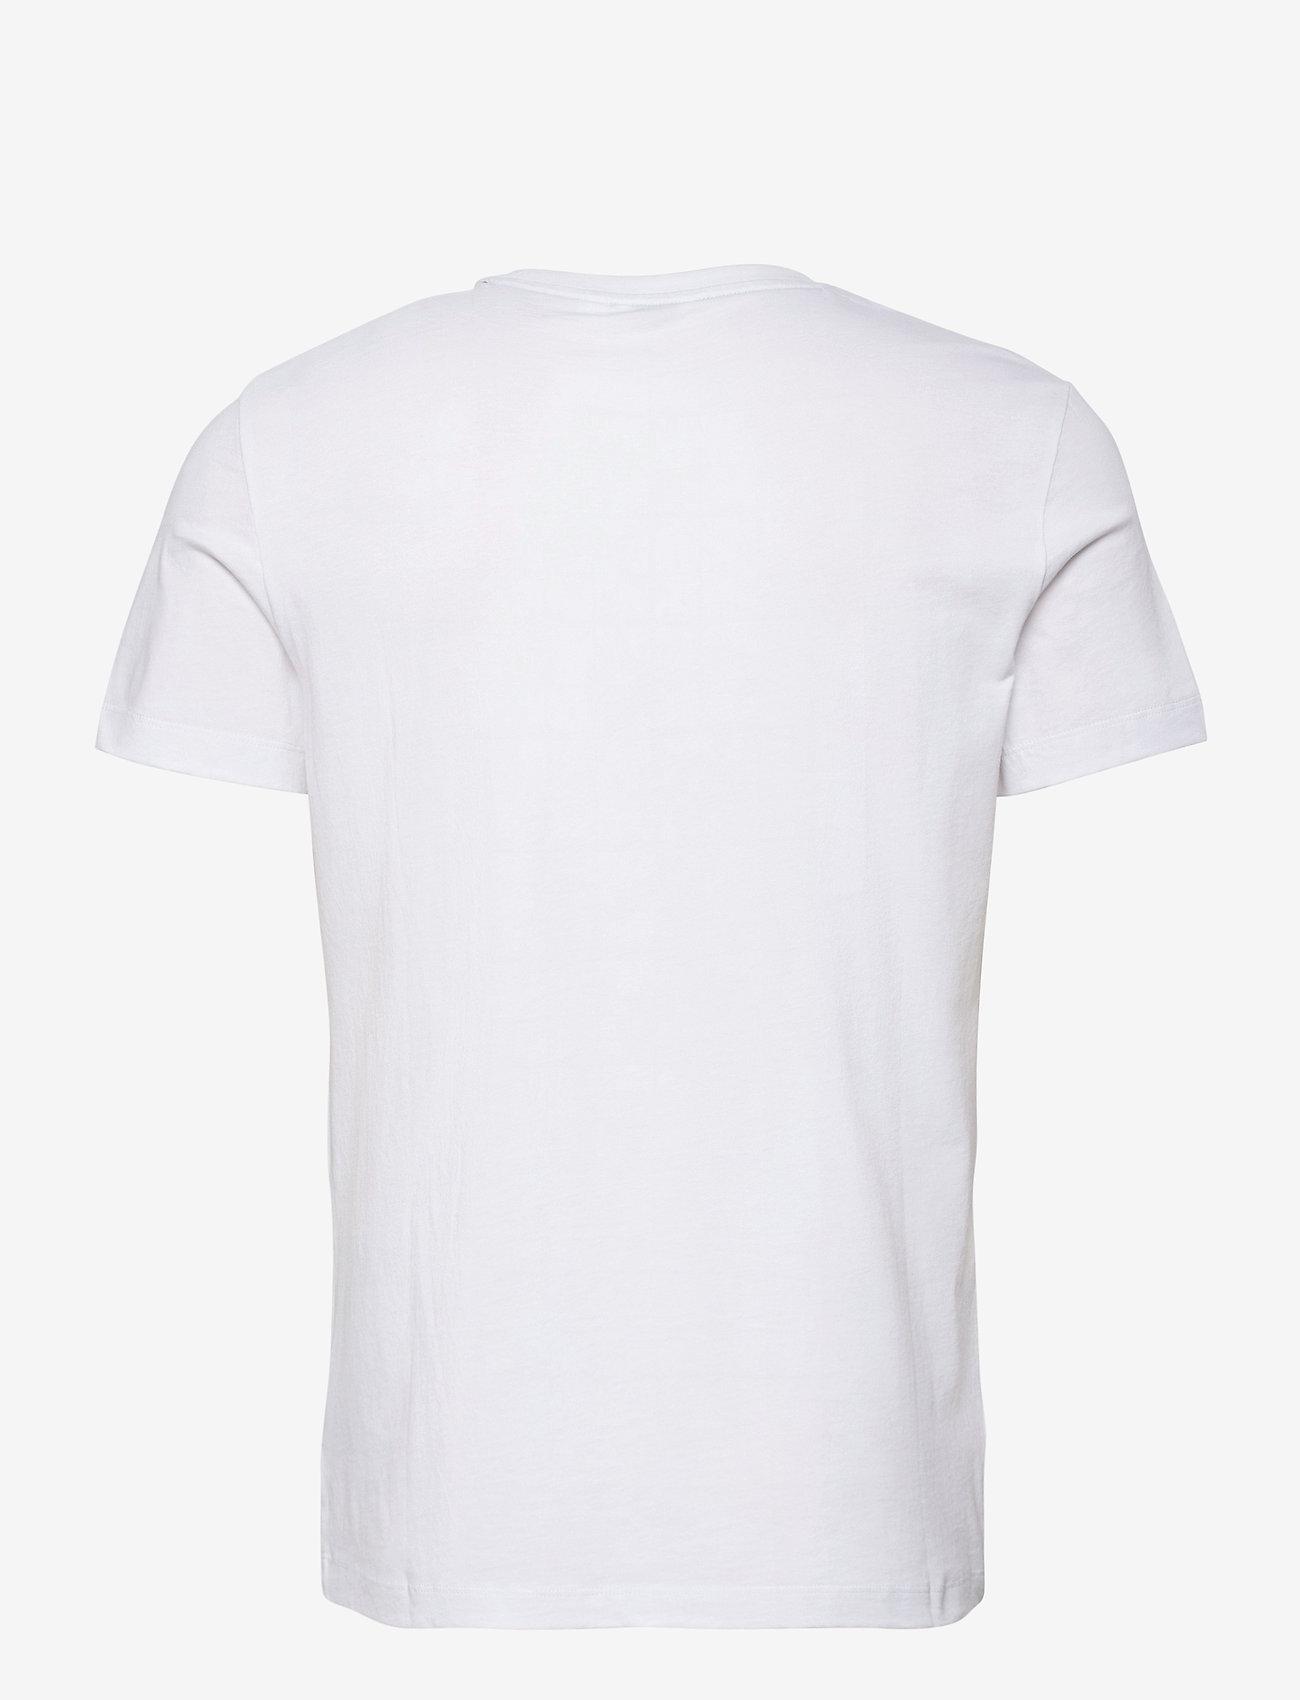 Björn Borg - TEE CENTRE CENTRE - basic t-shirts - brilliant white - 1